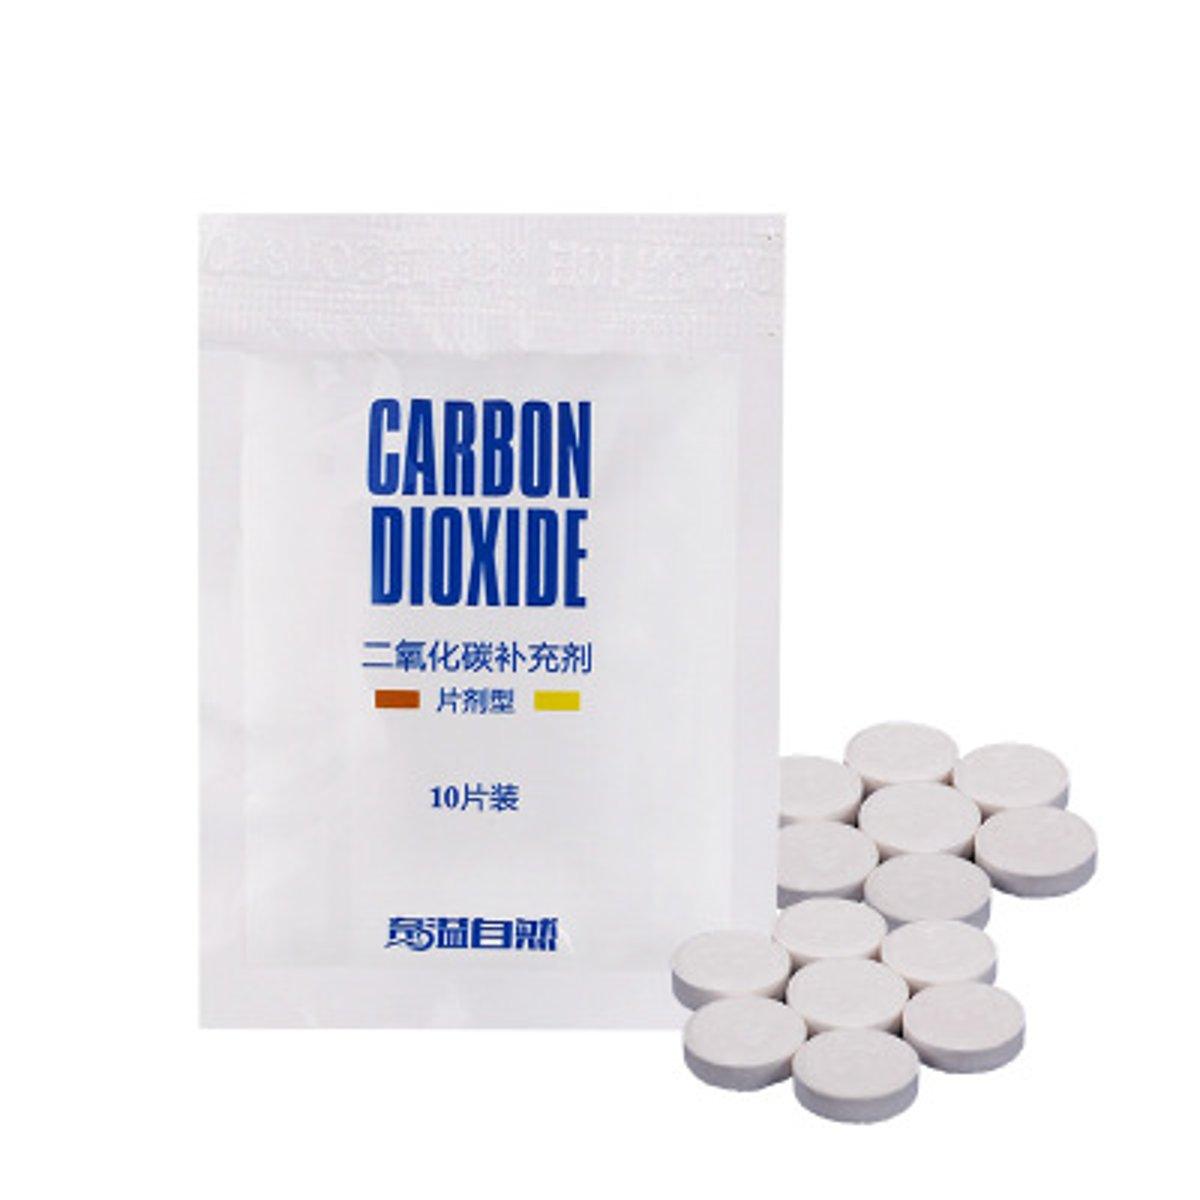 Aquarium Y-701 CO2 Tablet Carbon Dioxide Supplements Non-toxic For Plants Aquarium Fish Tank Diffuser Water Plants